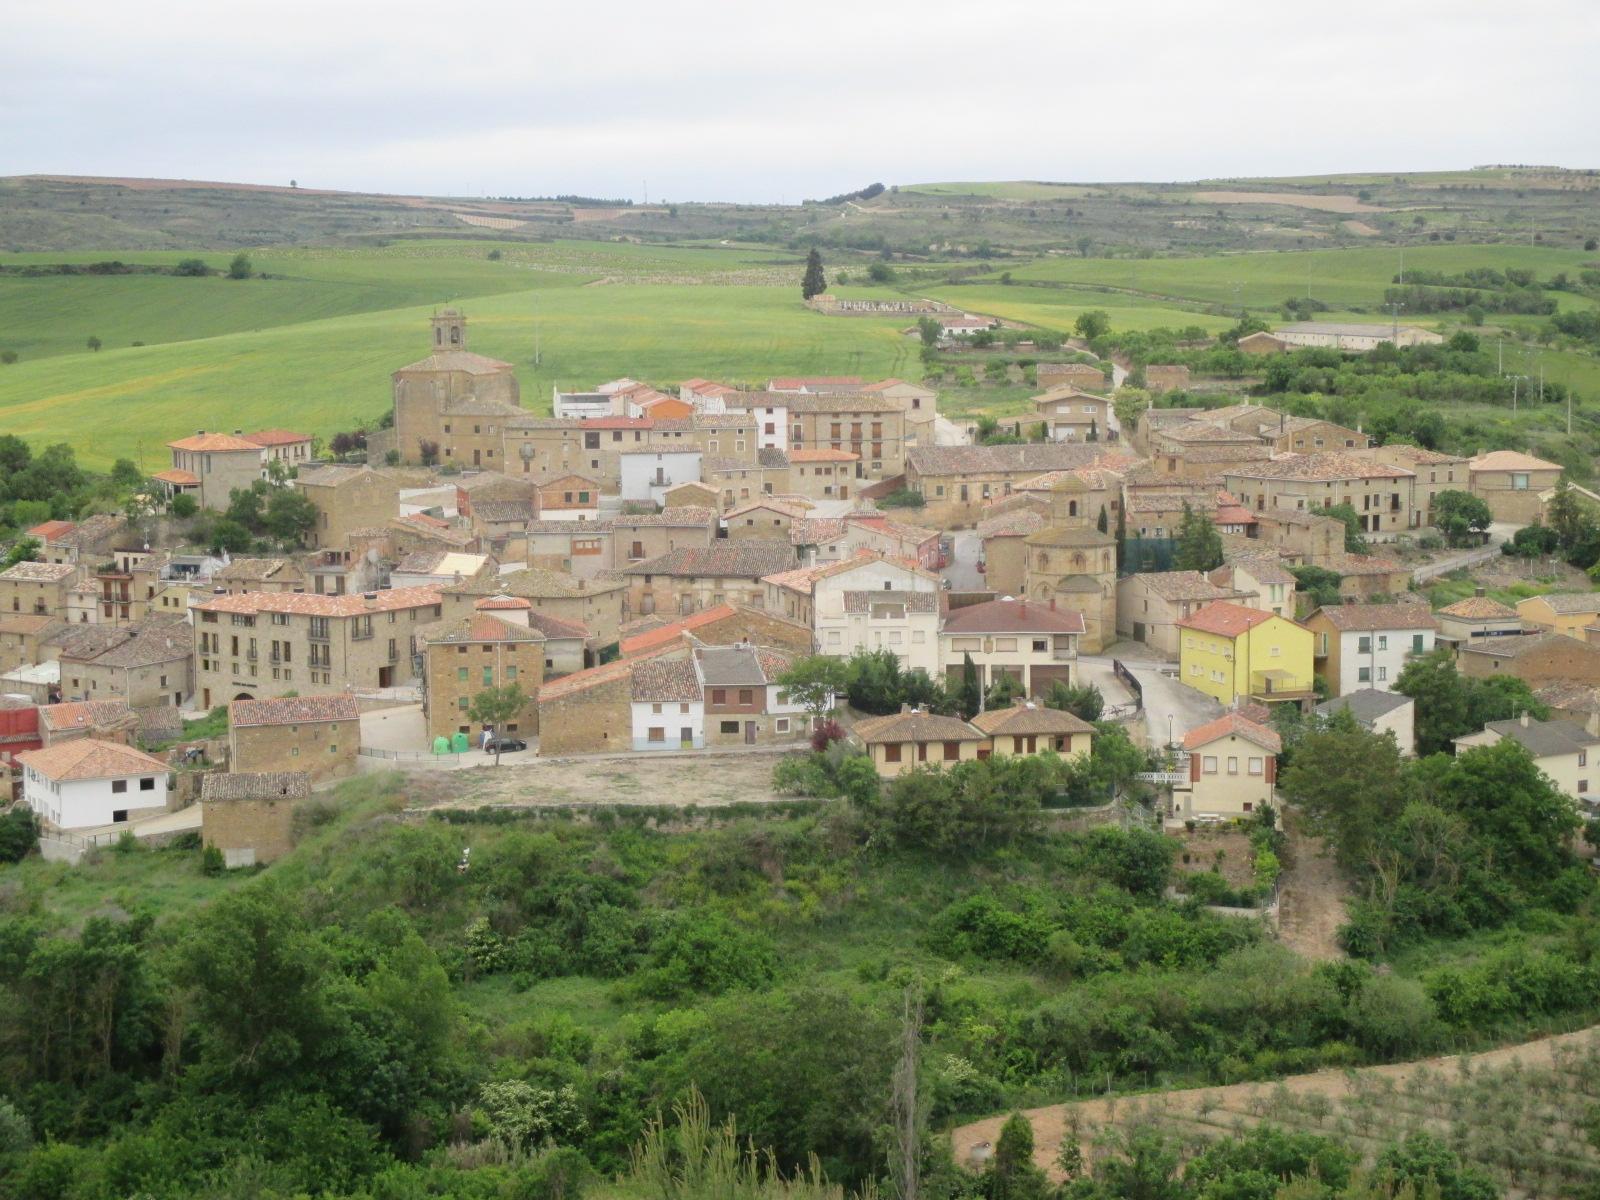 5.- ESTELLA-SANSOL-TORRES DEL RÍO (28 km) (29 km) (26 km desde el camping de Iratxe)